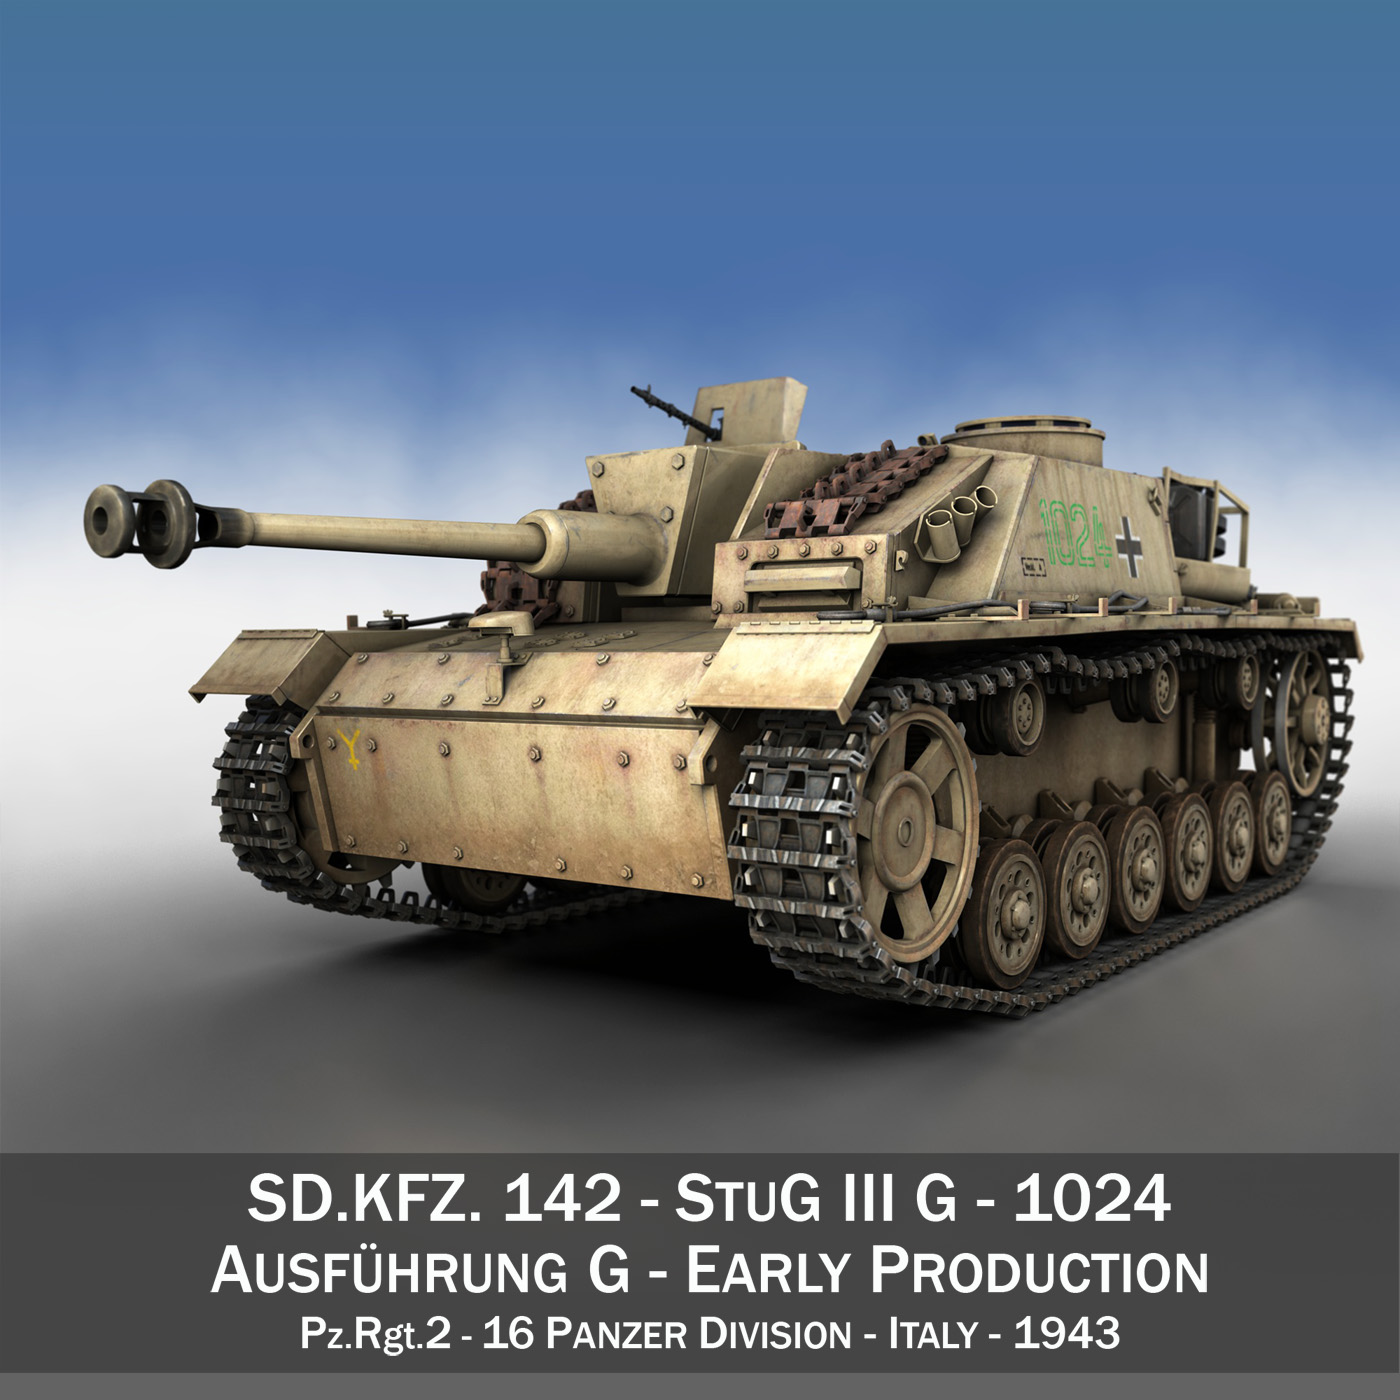 StuG III - Ausf.G - 1024 - Early Production 3d model 3ds fbx c4d lwo lws lw obj 282602